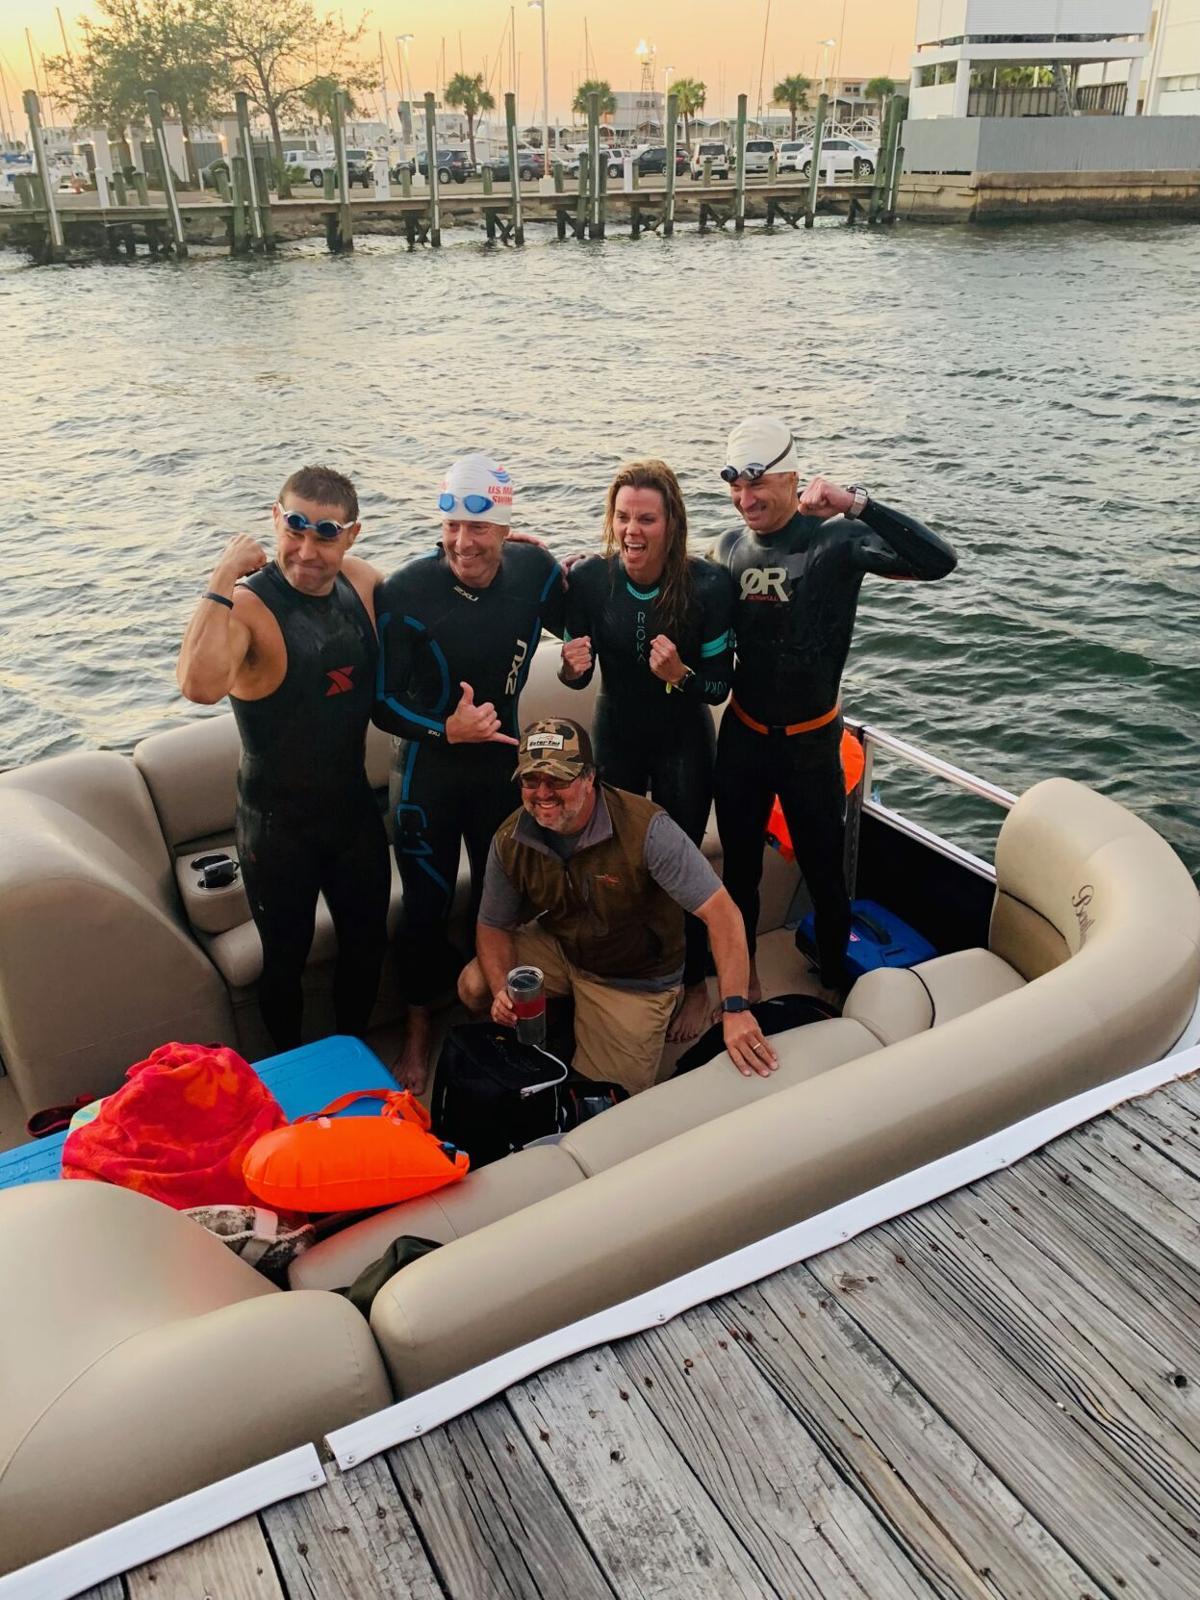 Lake swimmers November 16, 2020